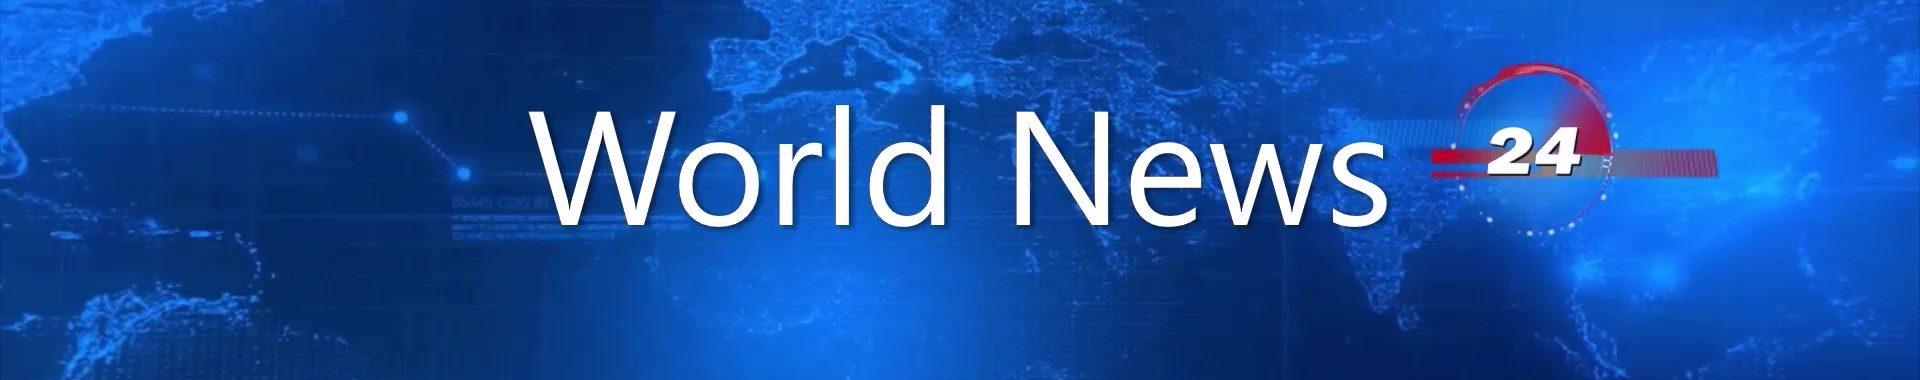 cropped-Logo-World-News-2412021.jpg